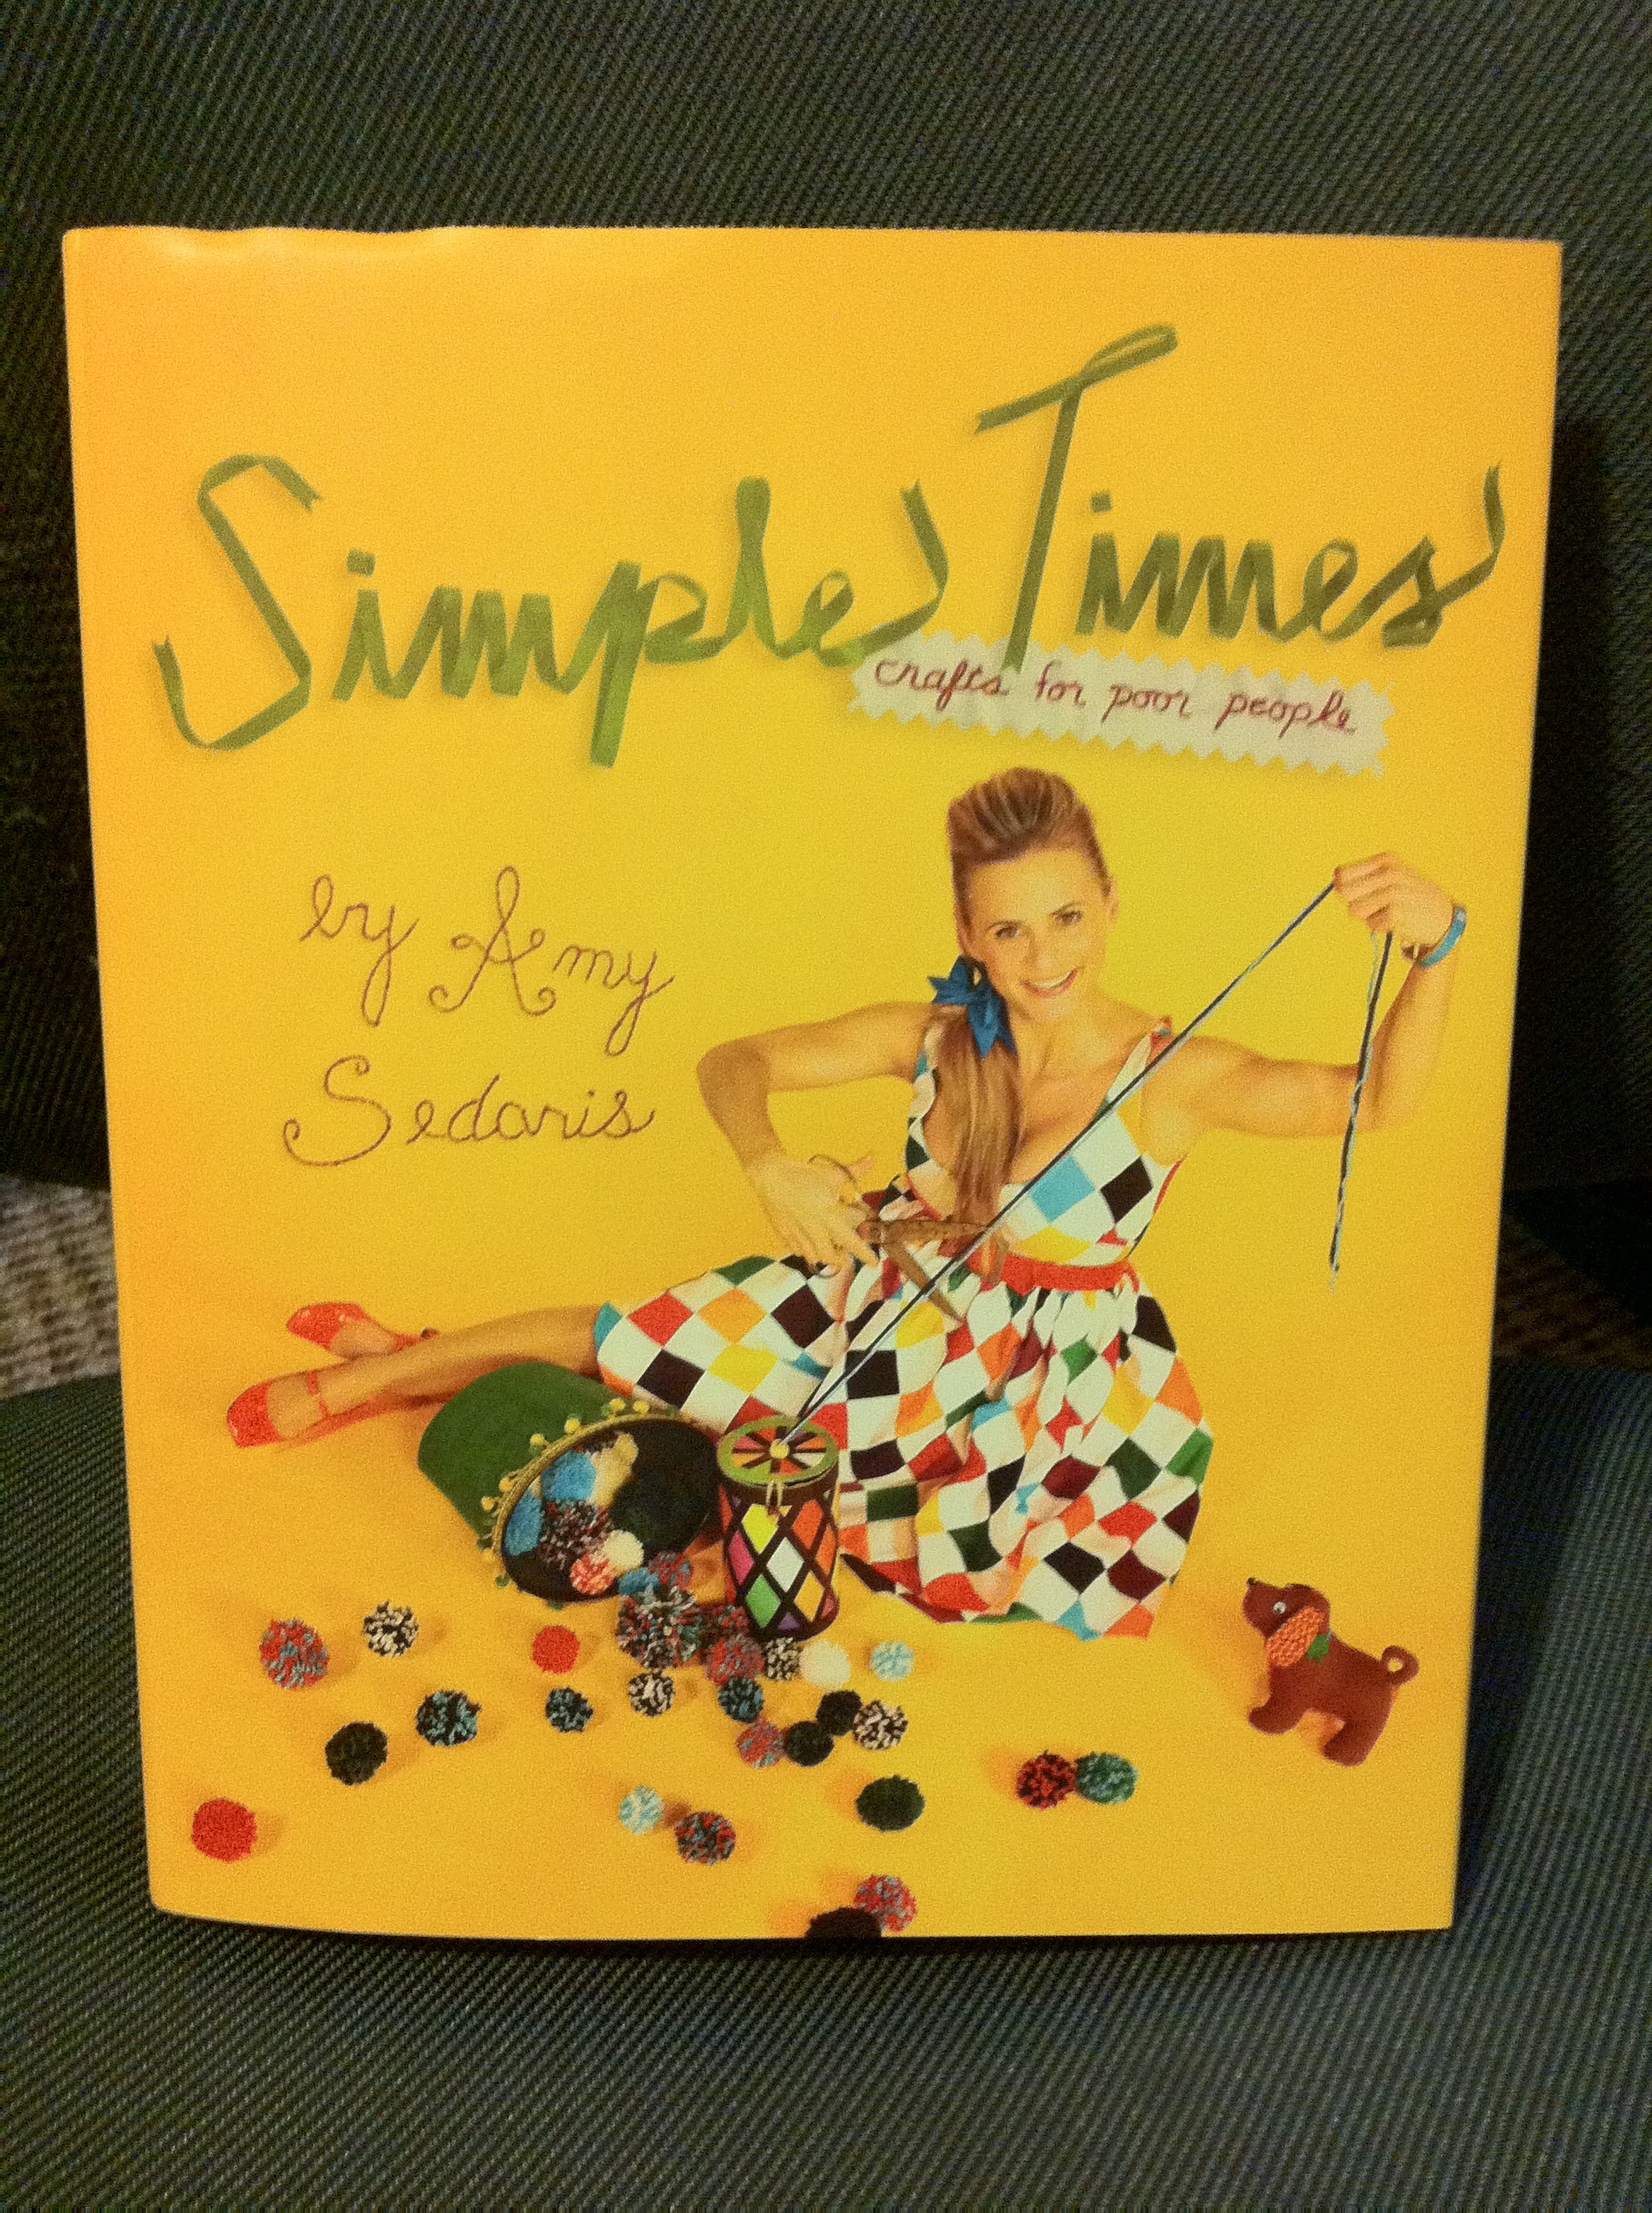 How to: Statistics Cross Stitch Inspired by Amy Sedaris